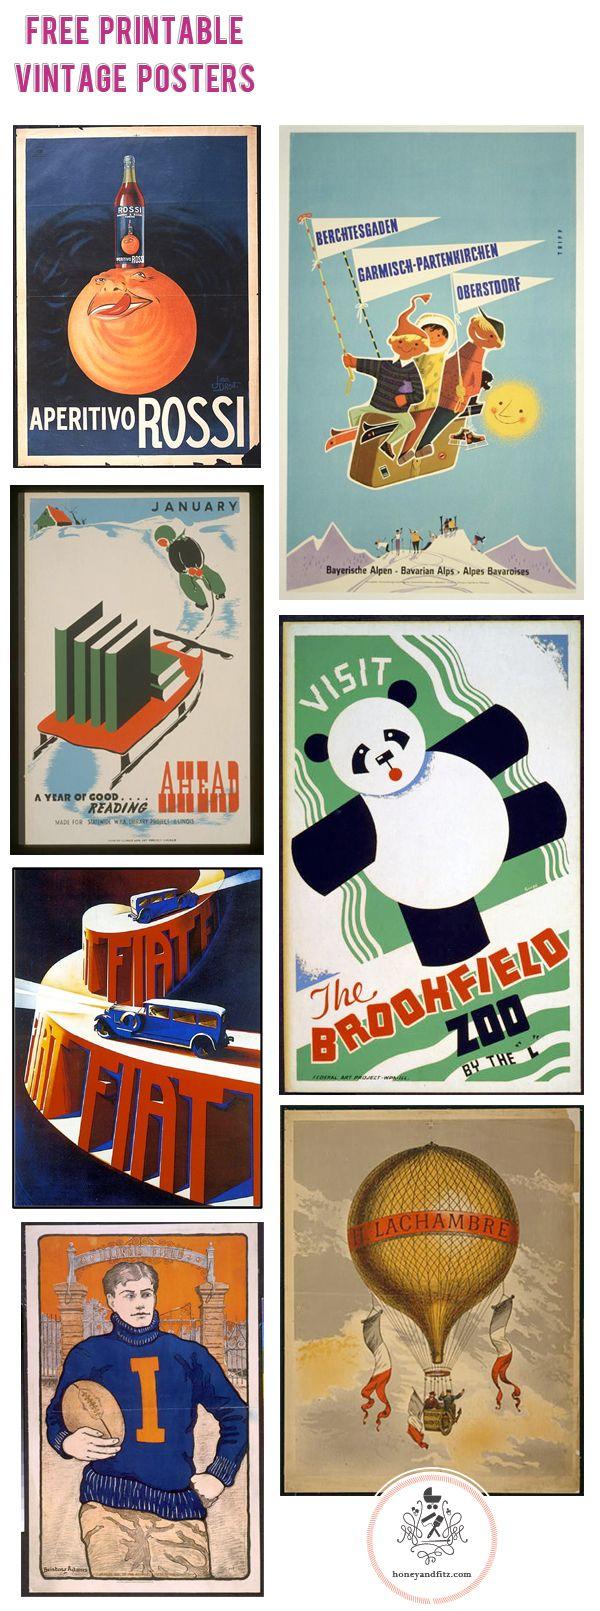 free printable vintage posters via honey fitz